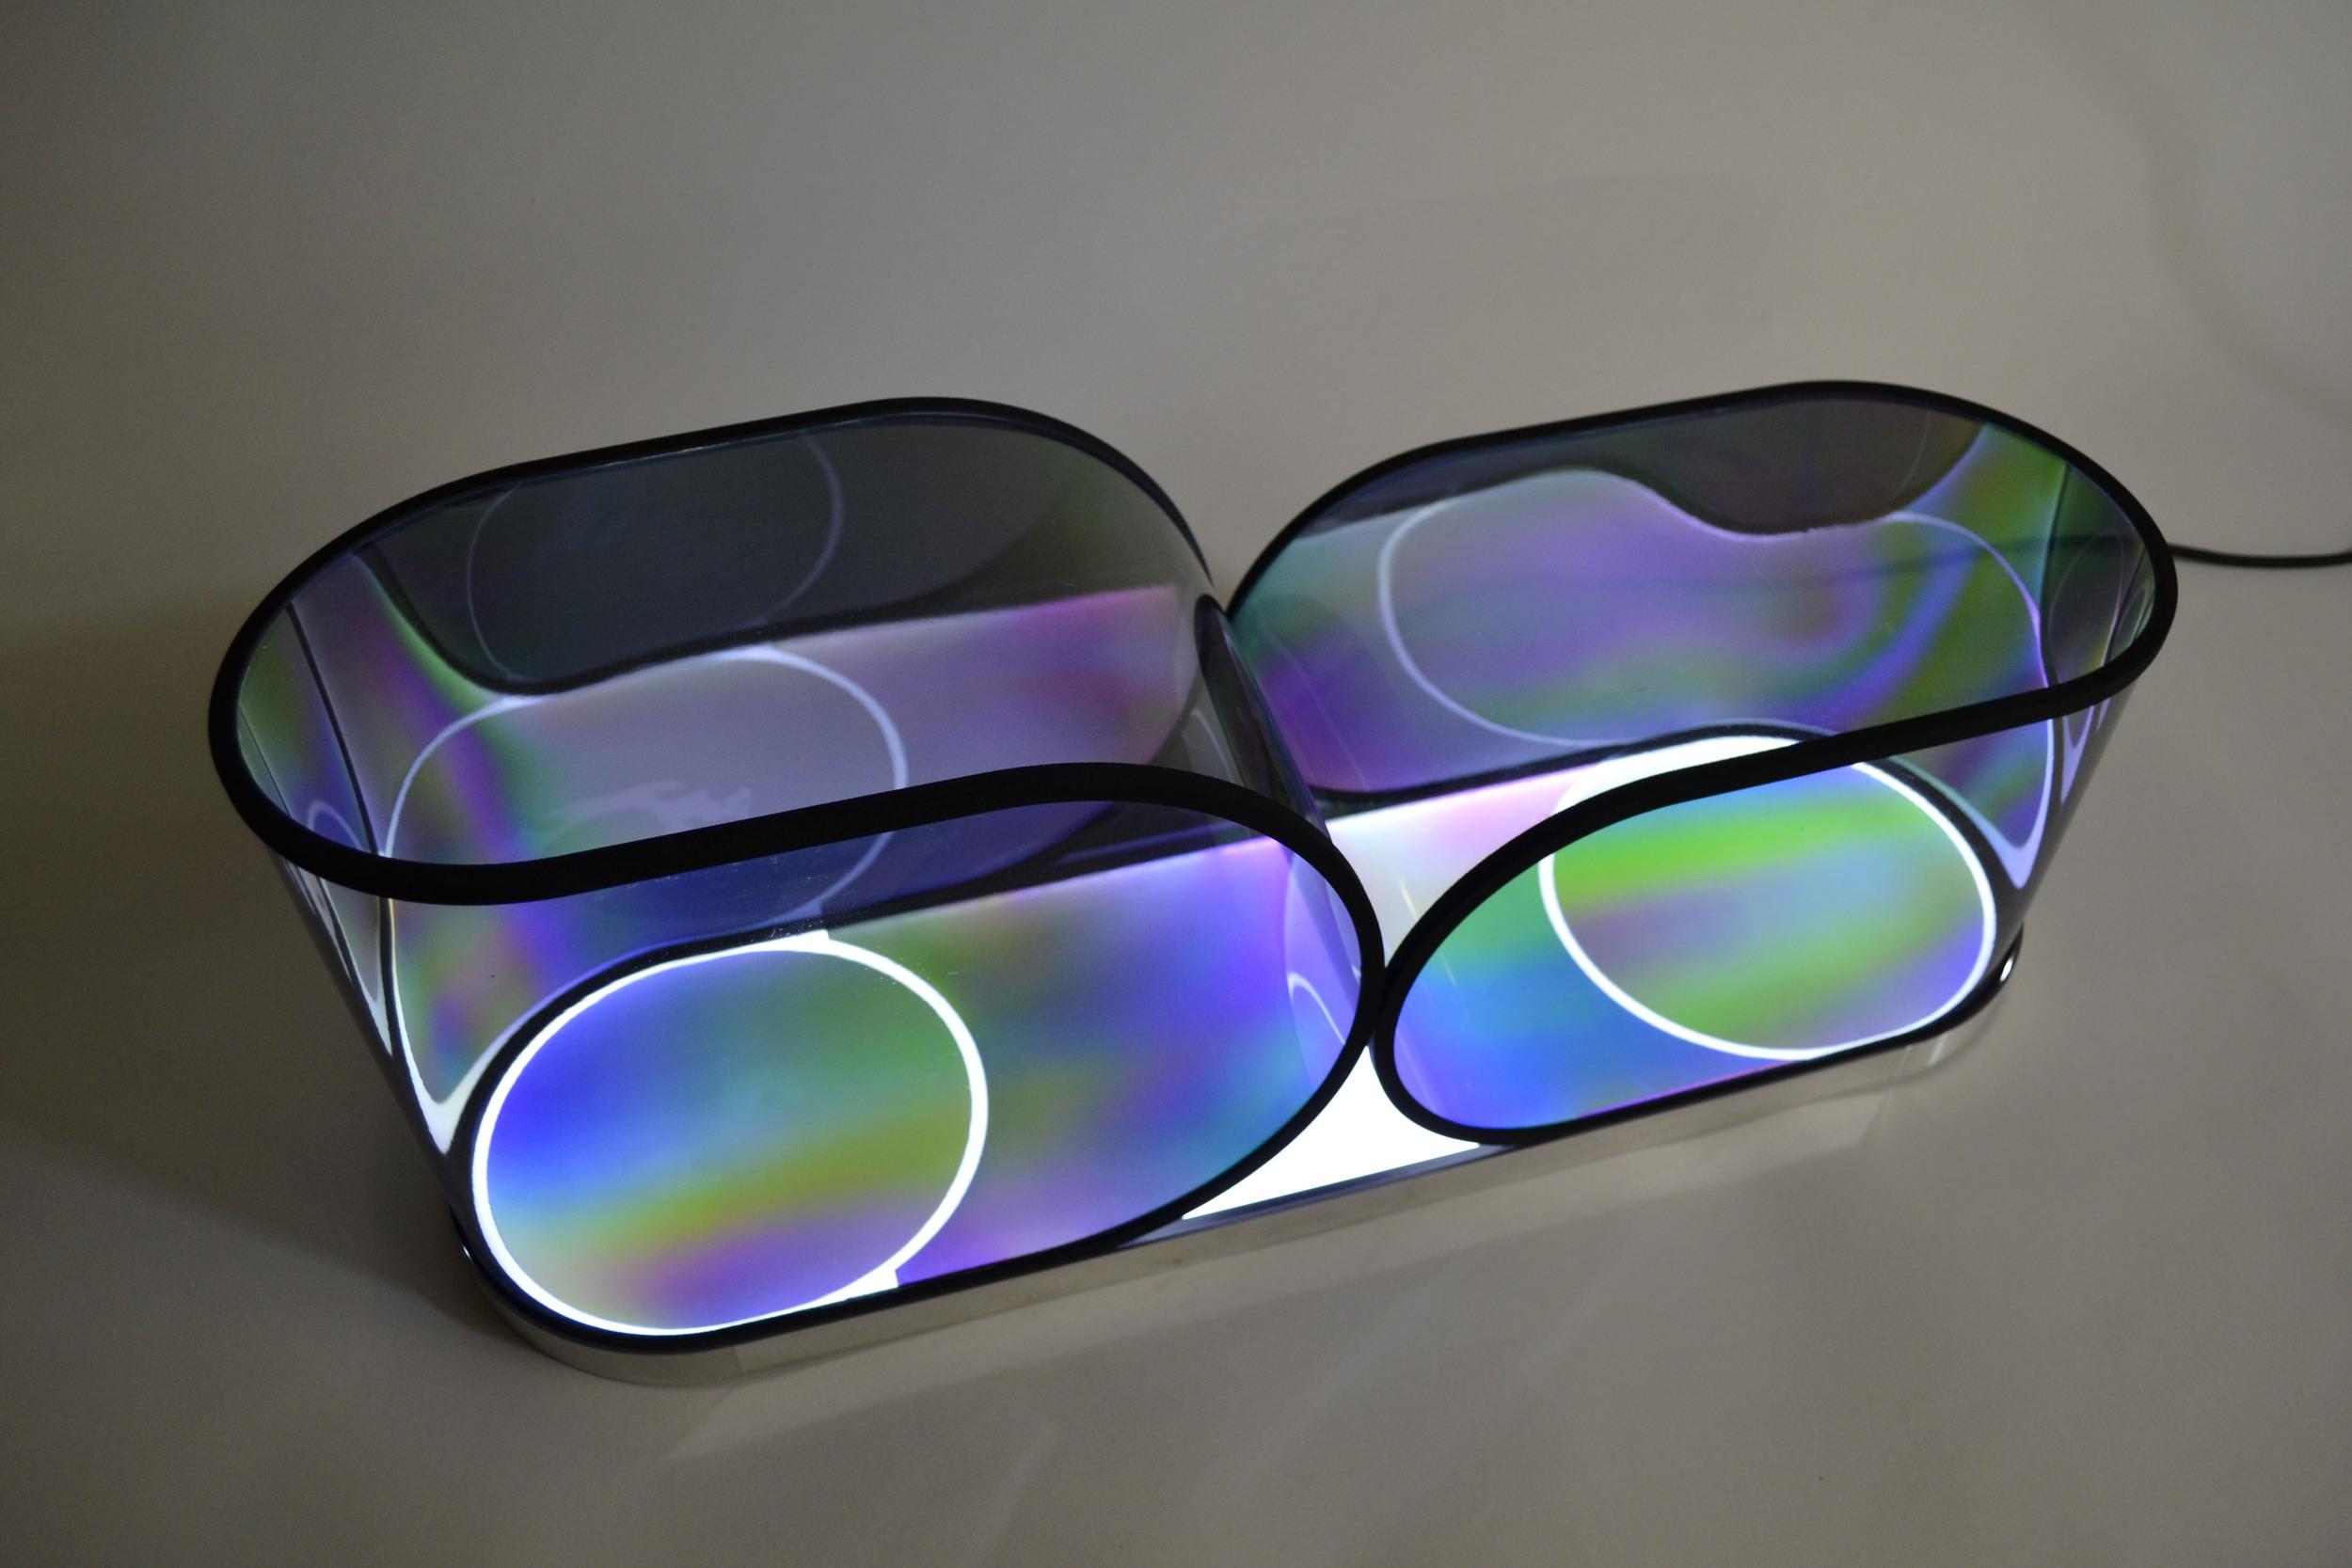 Spectrum Cabinets by Onno Adriaanse.